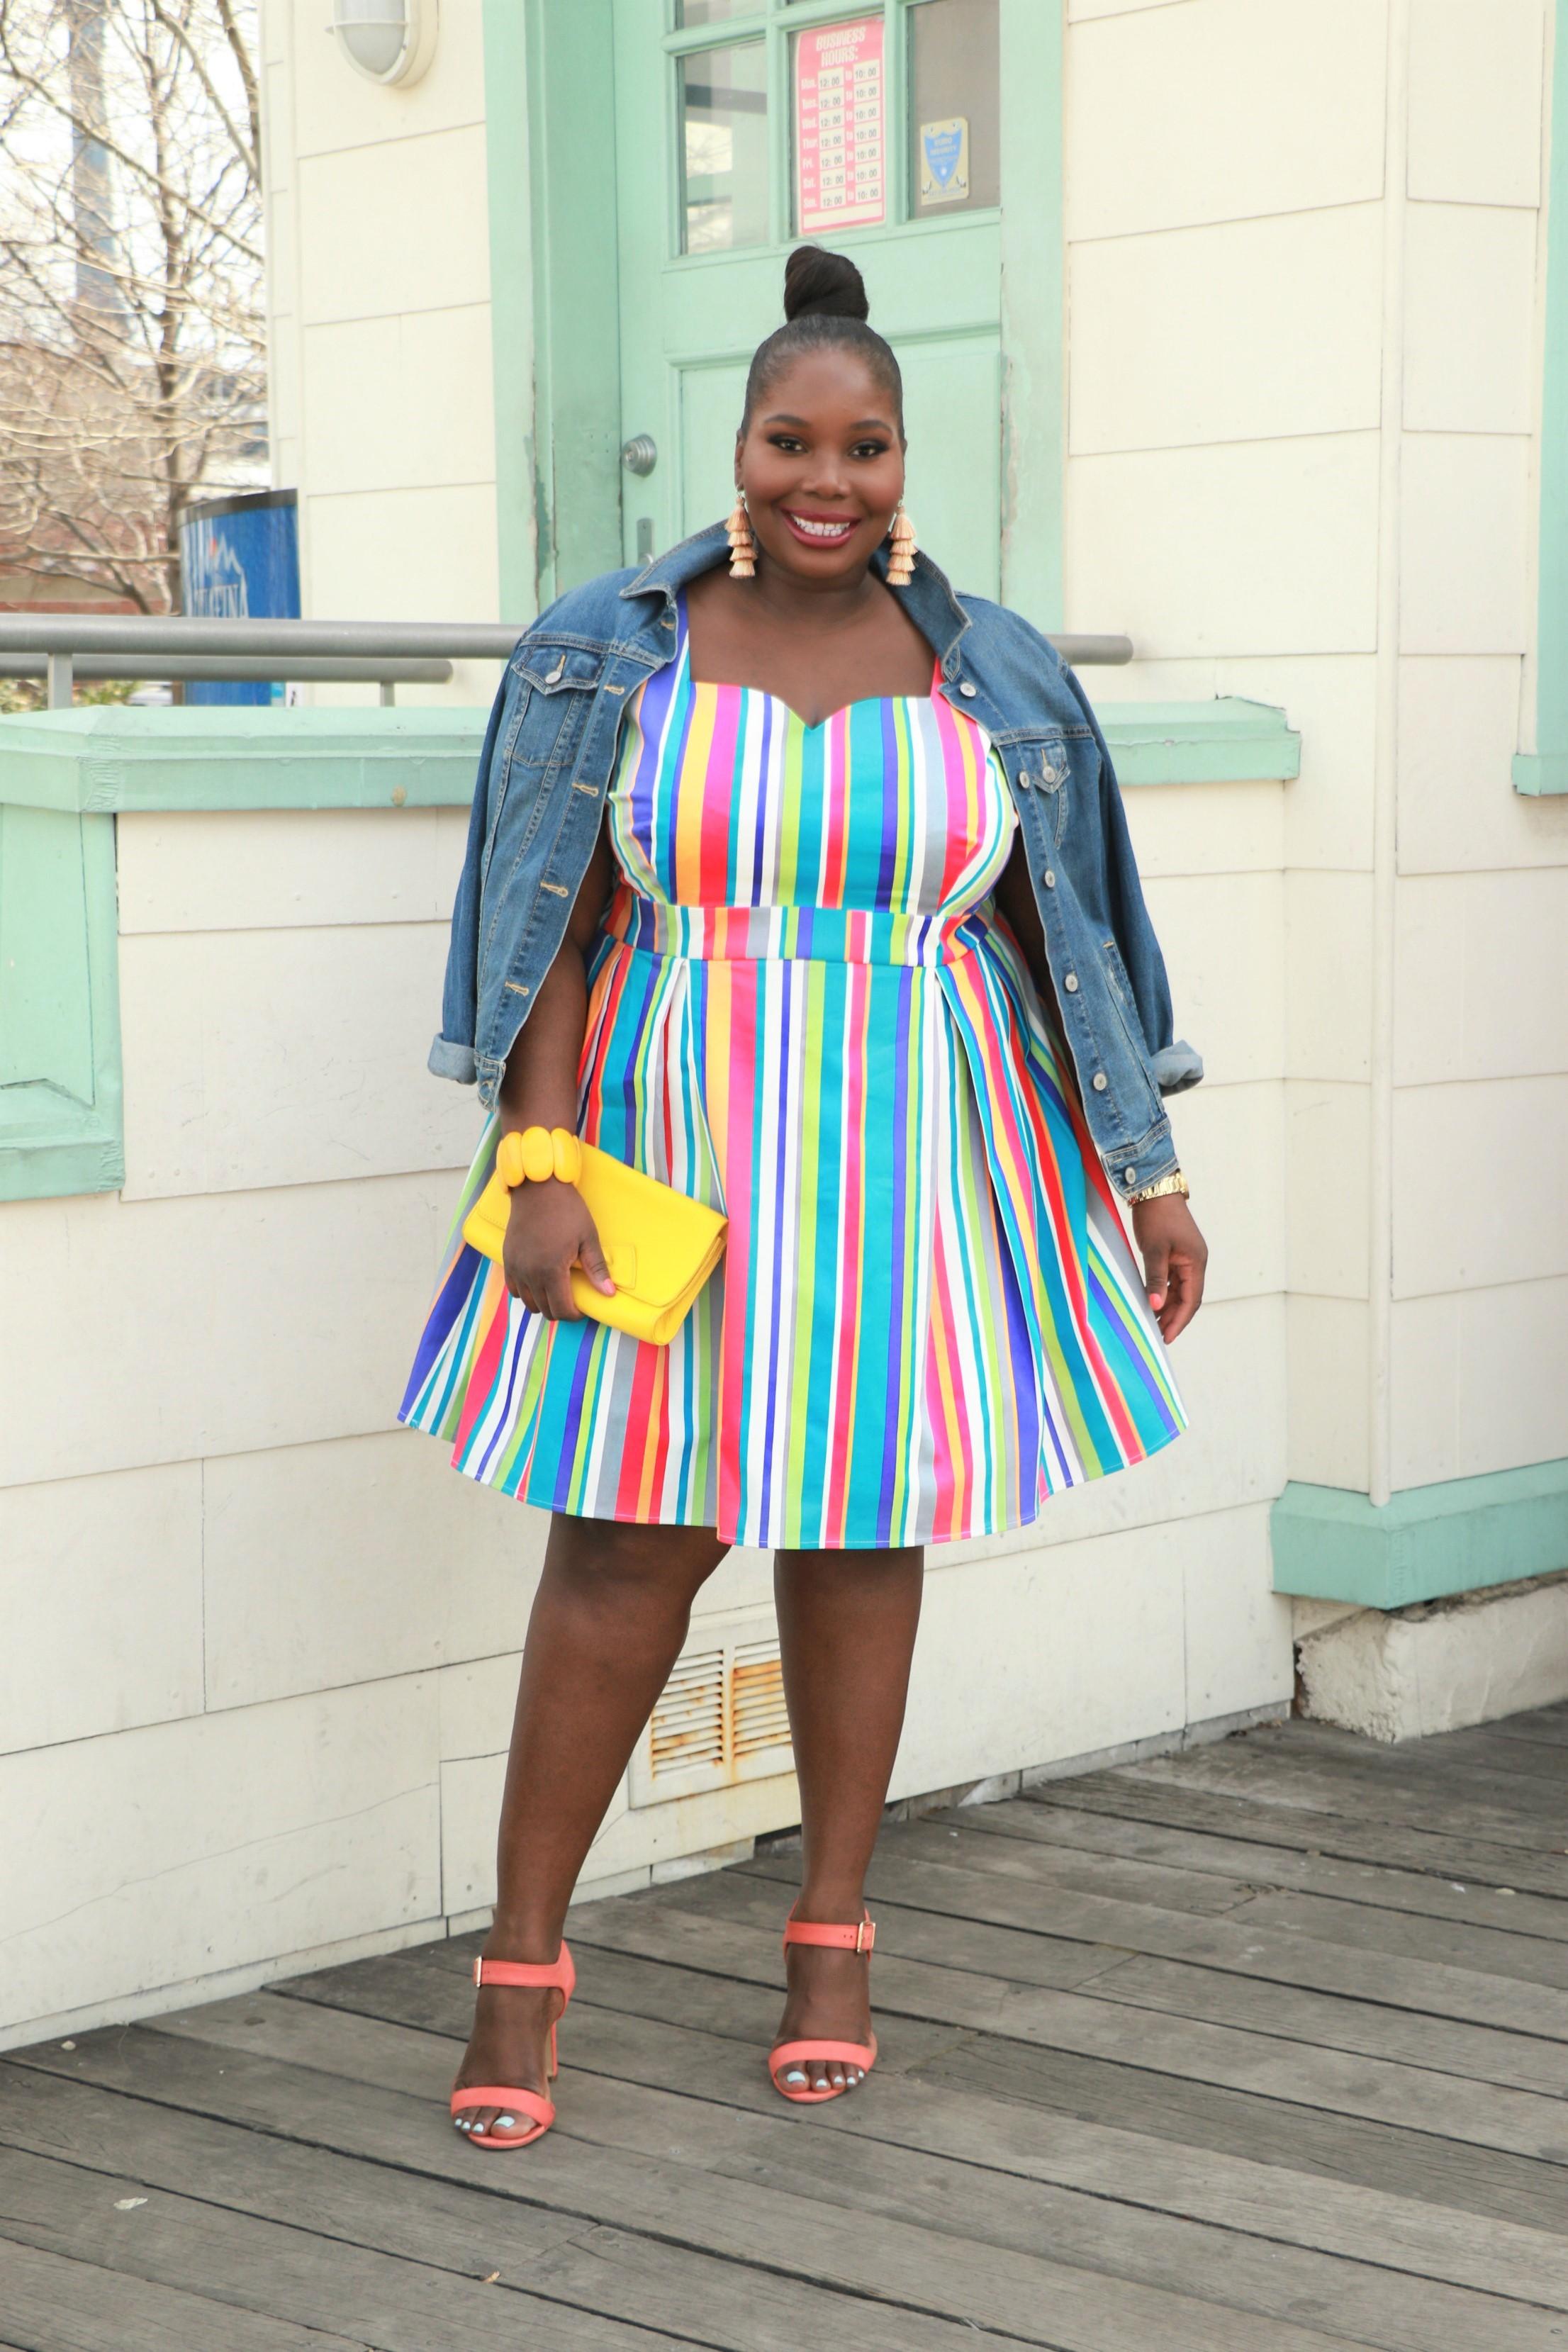 e7085ebe41ed7 Although I Hate My Arms,This Modcloth Rainbow Dress Helped Me ...